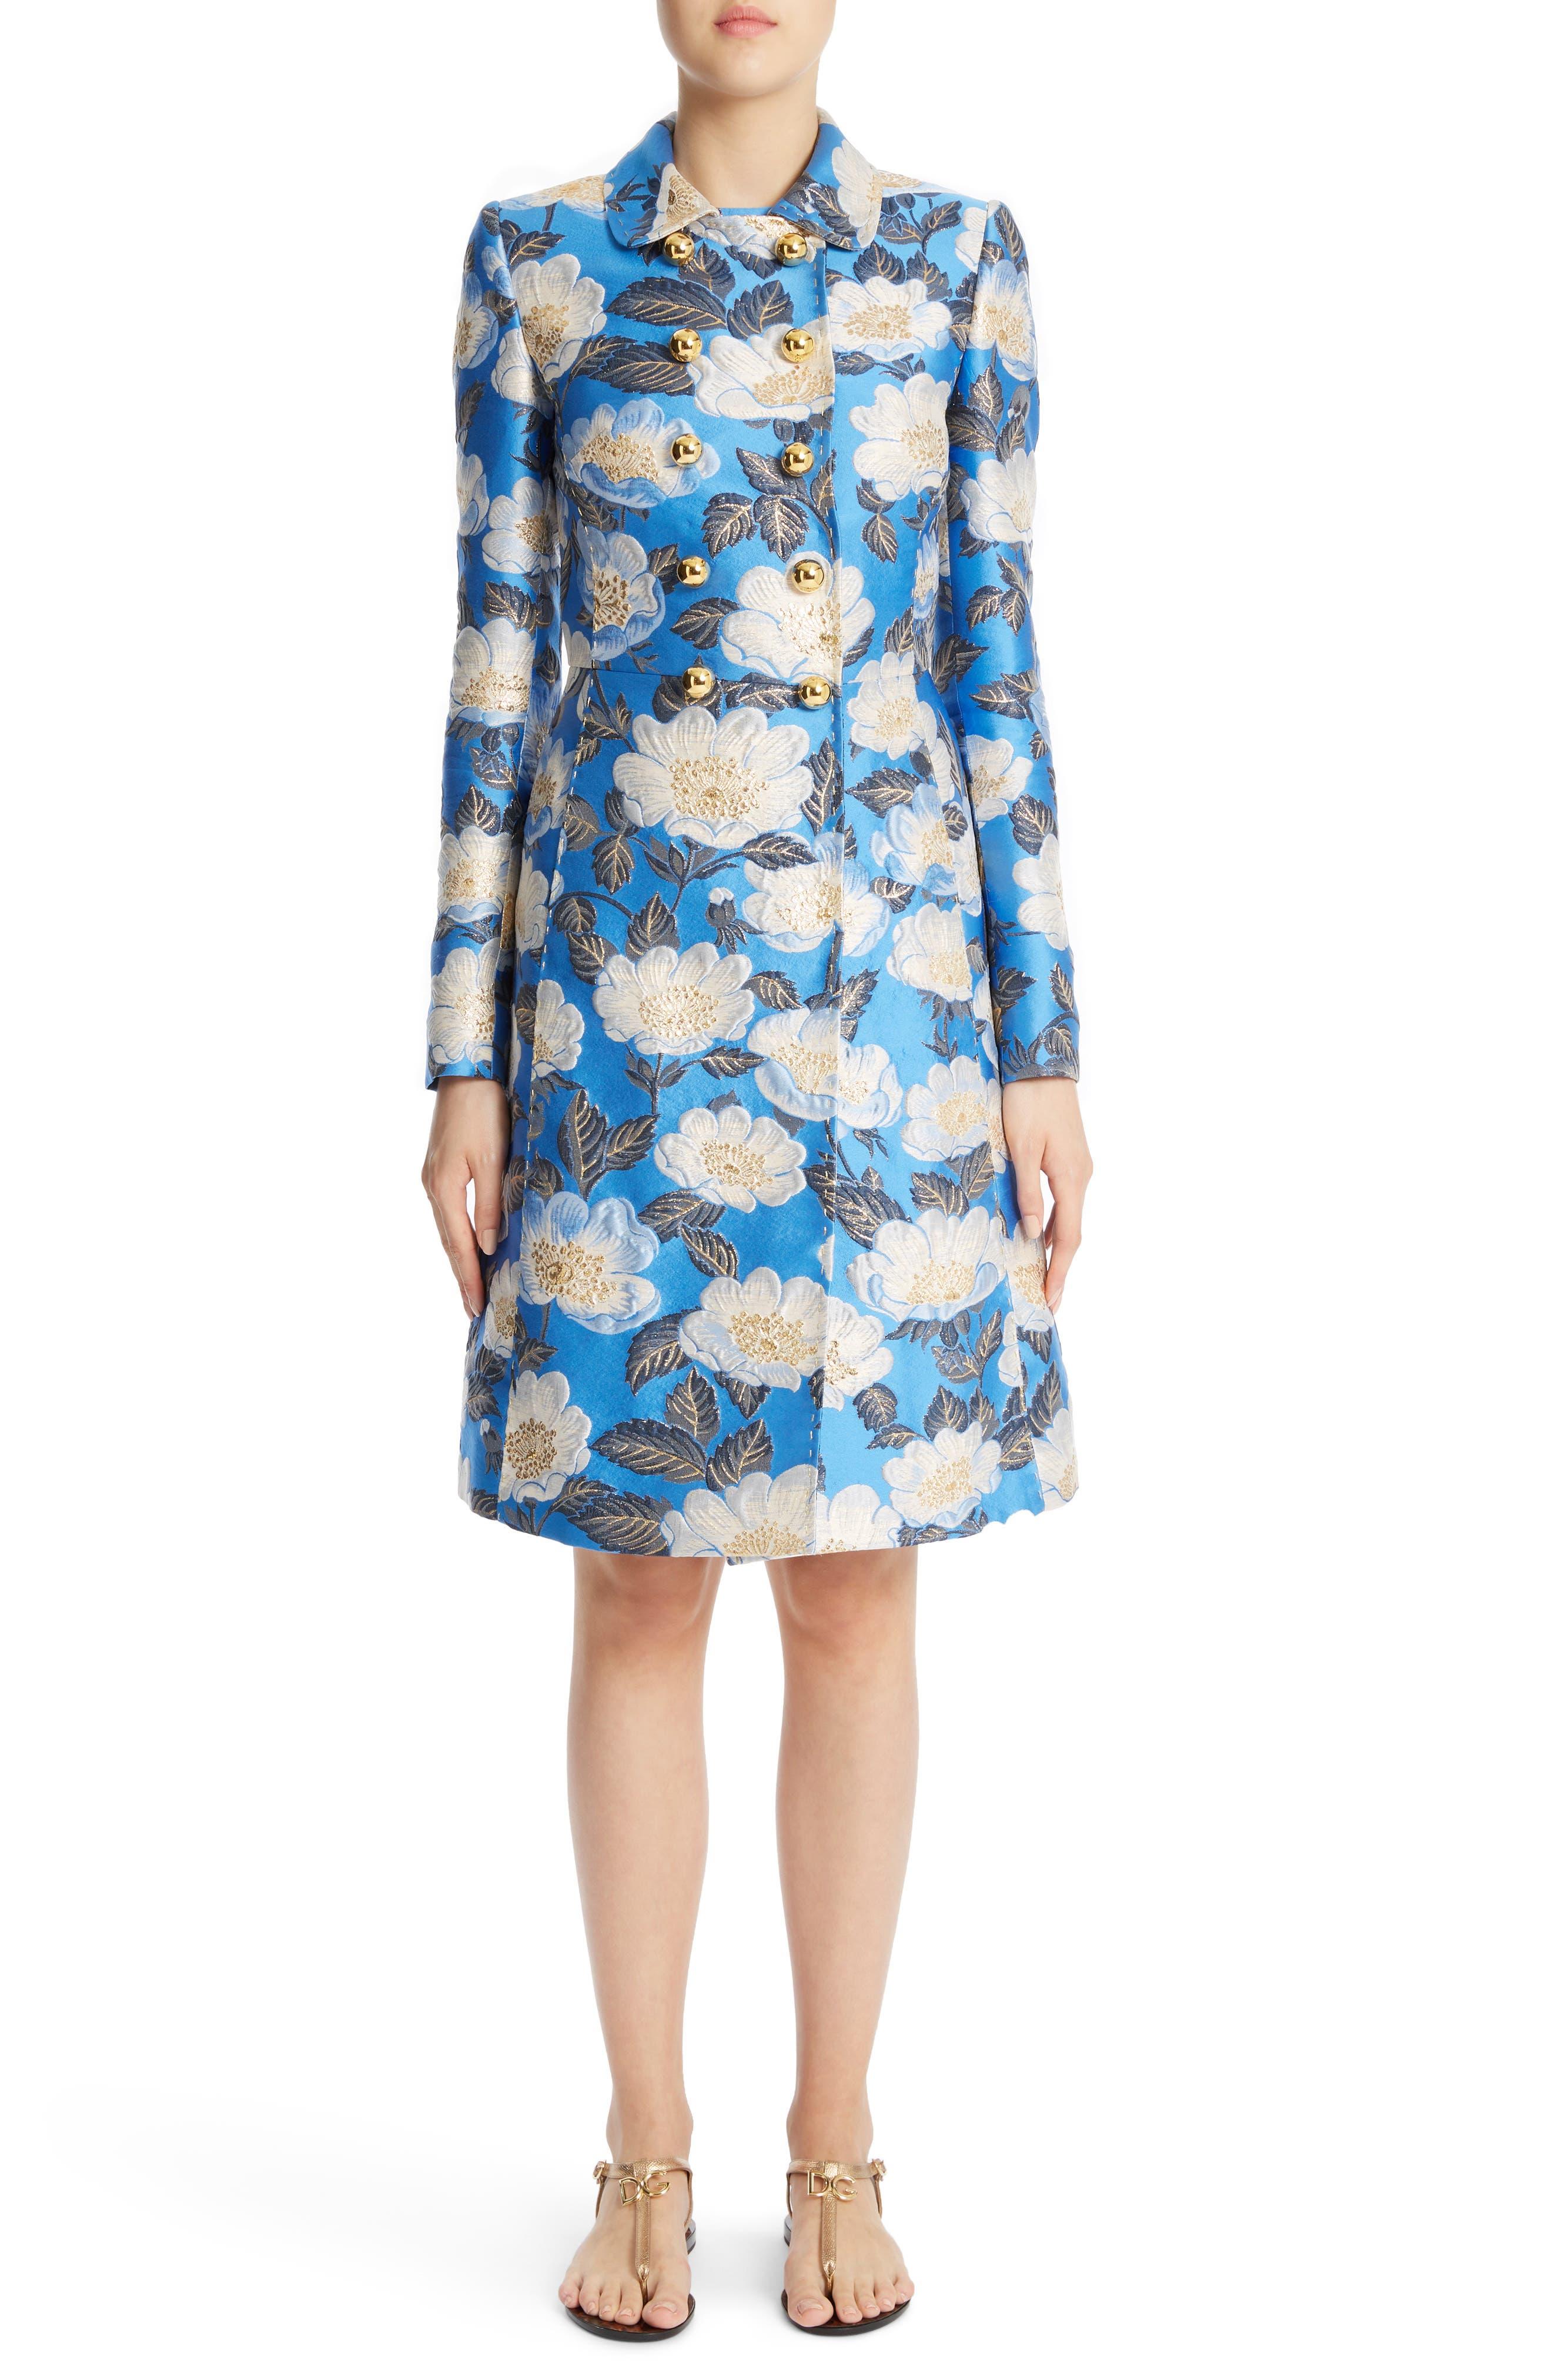 Dolce&Gabbana Floral Brocade Coat